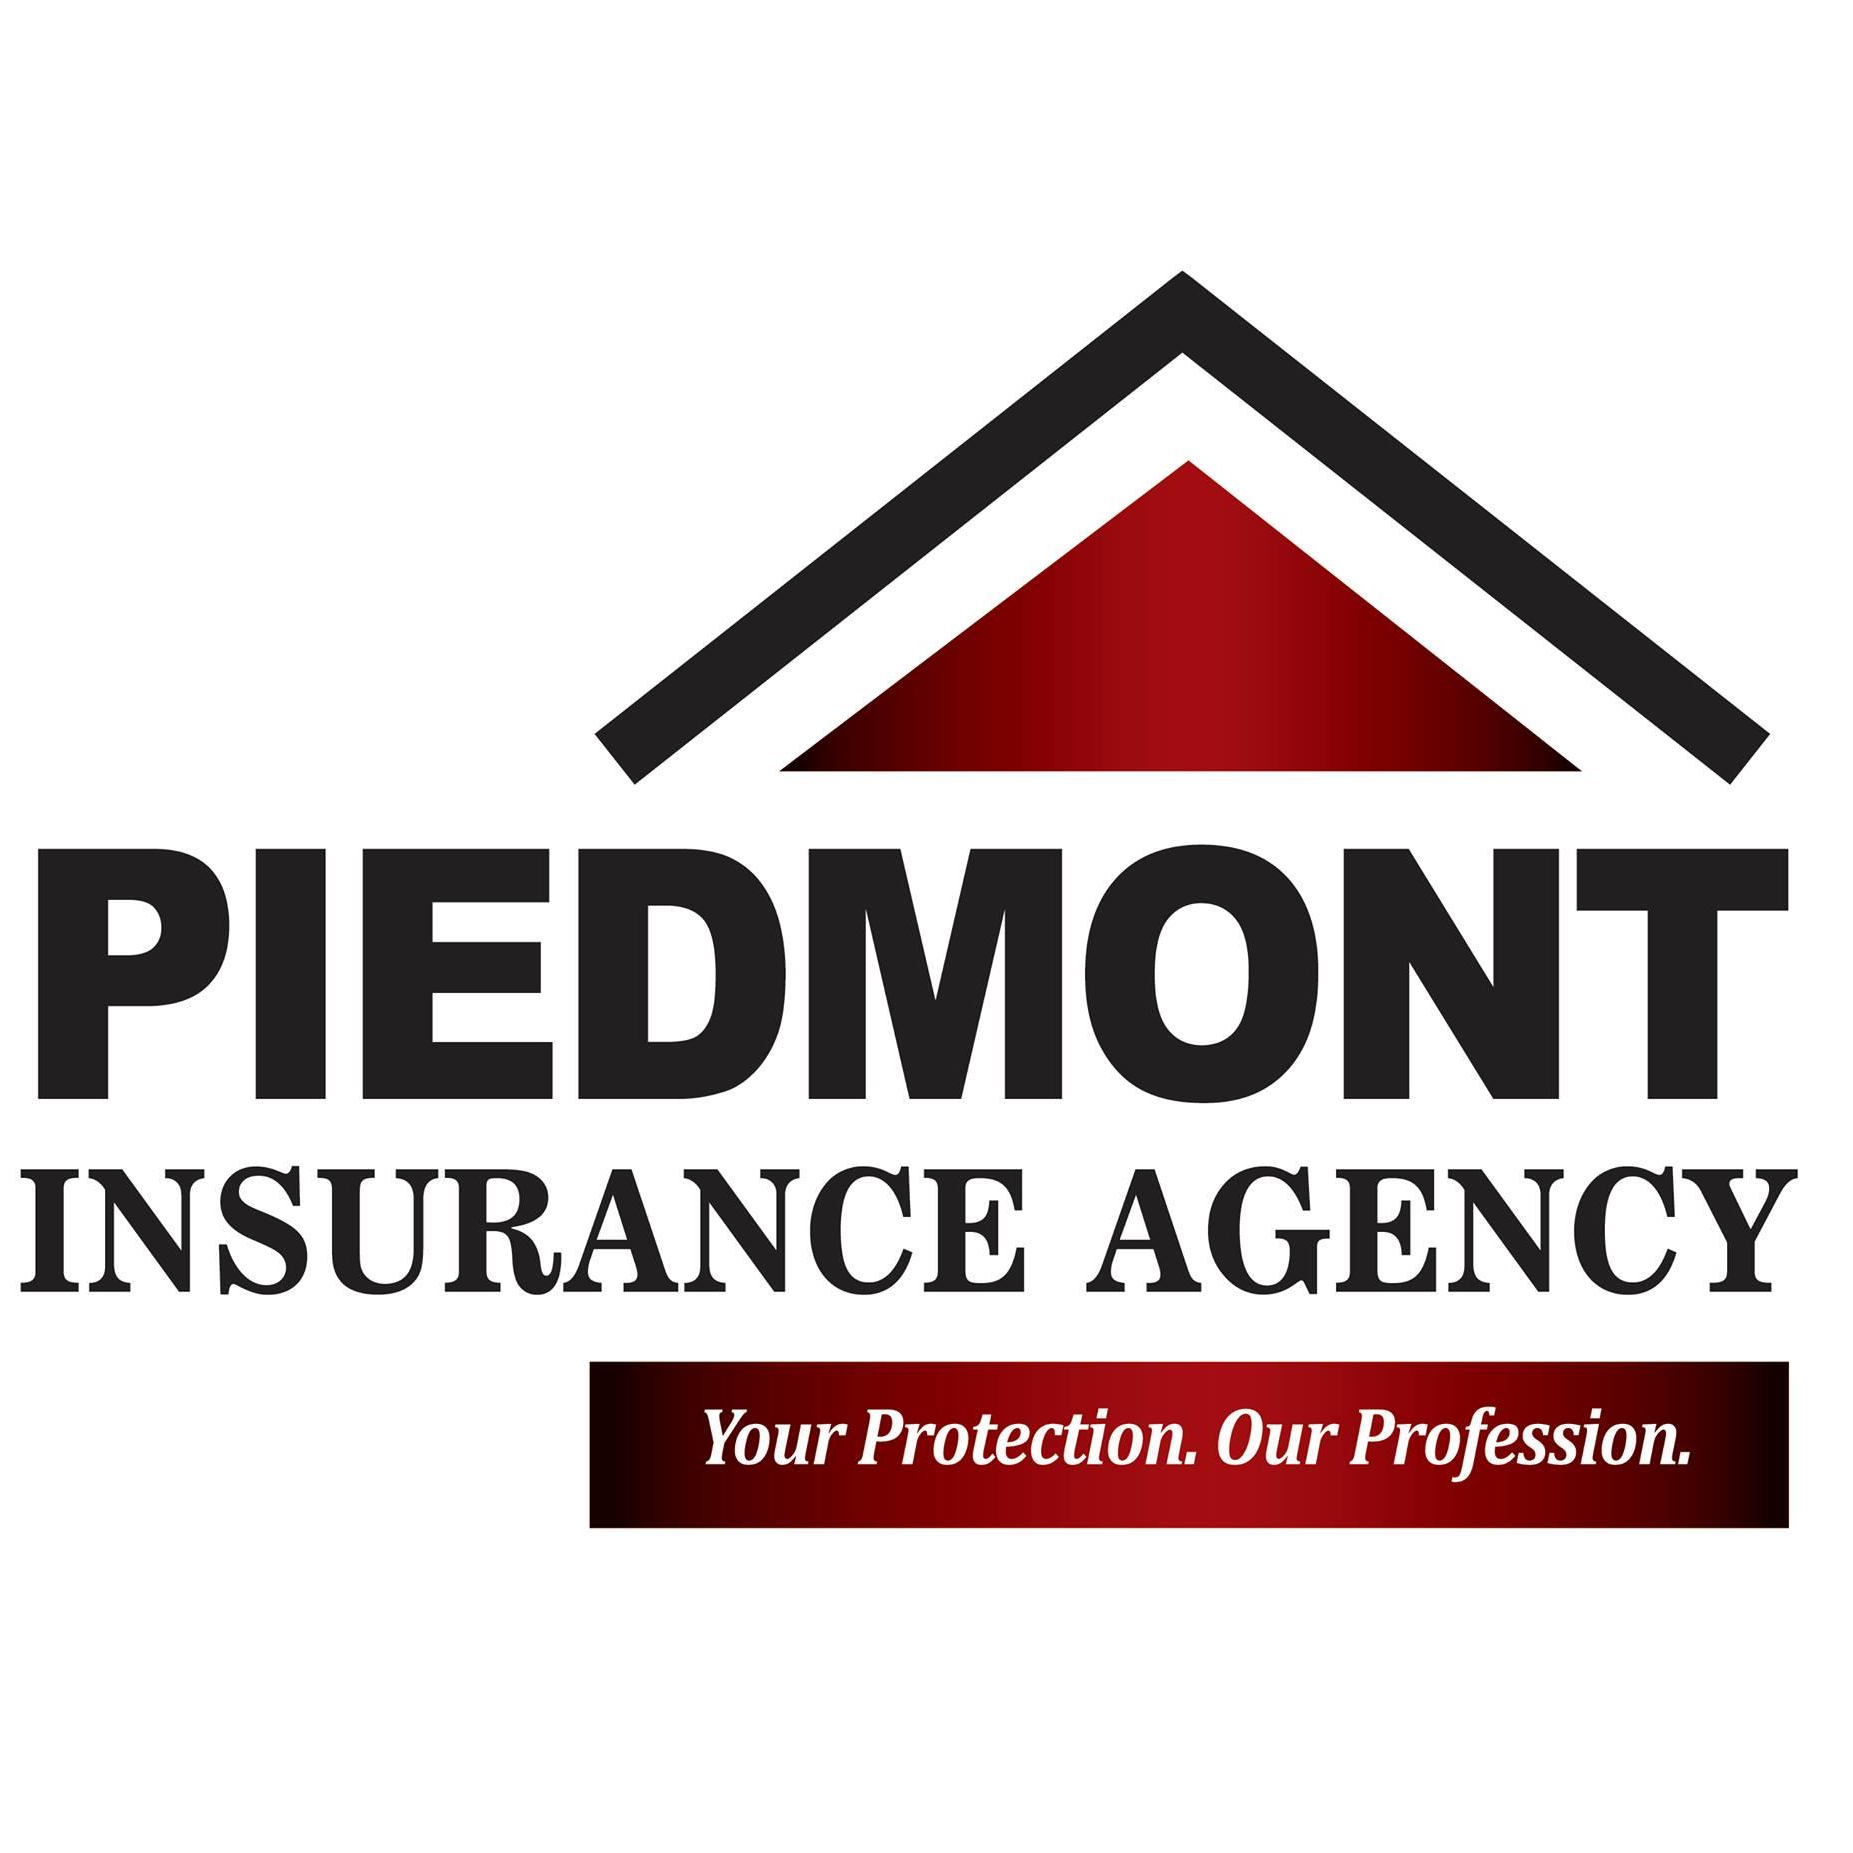 Piedmont Insurance Agency